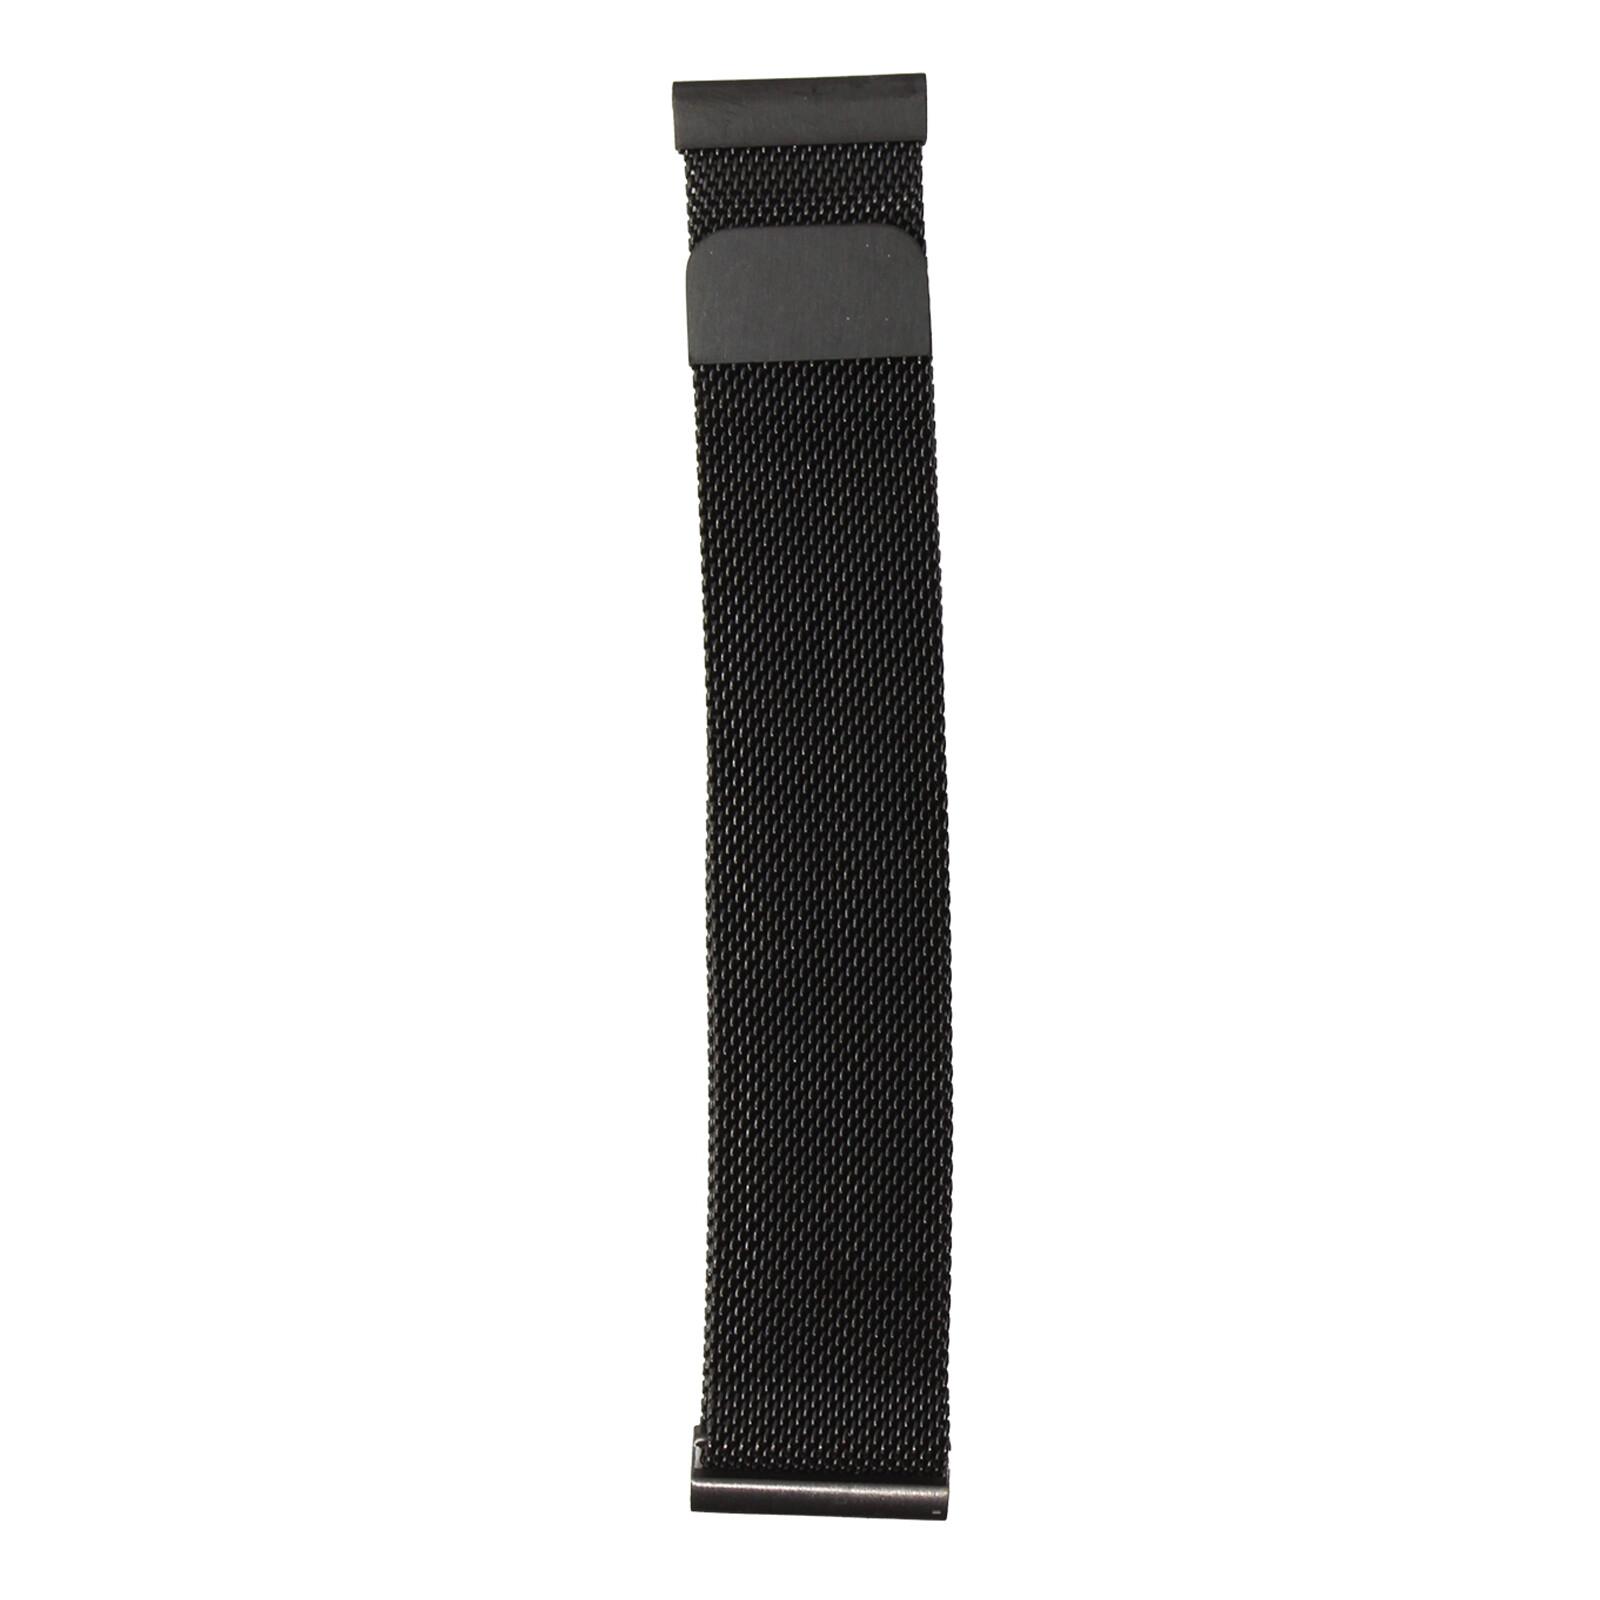 Mika Uhrenarmband Uni 22mm Edelstahl Milanaise schwarz